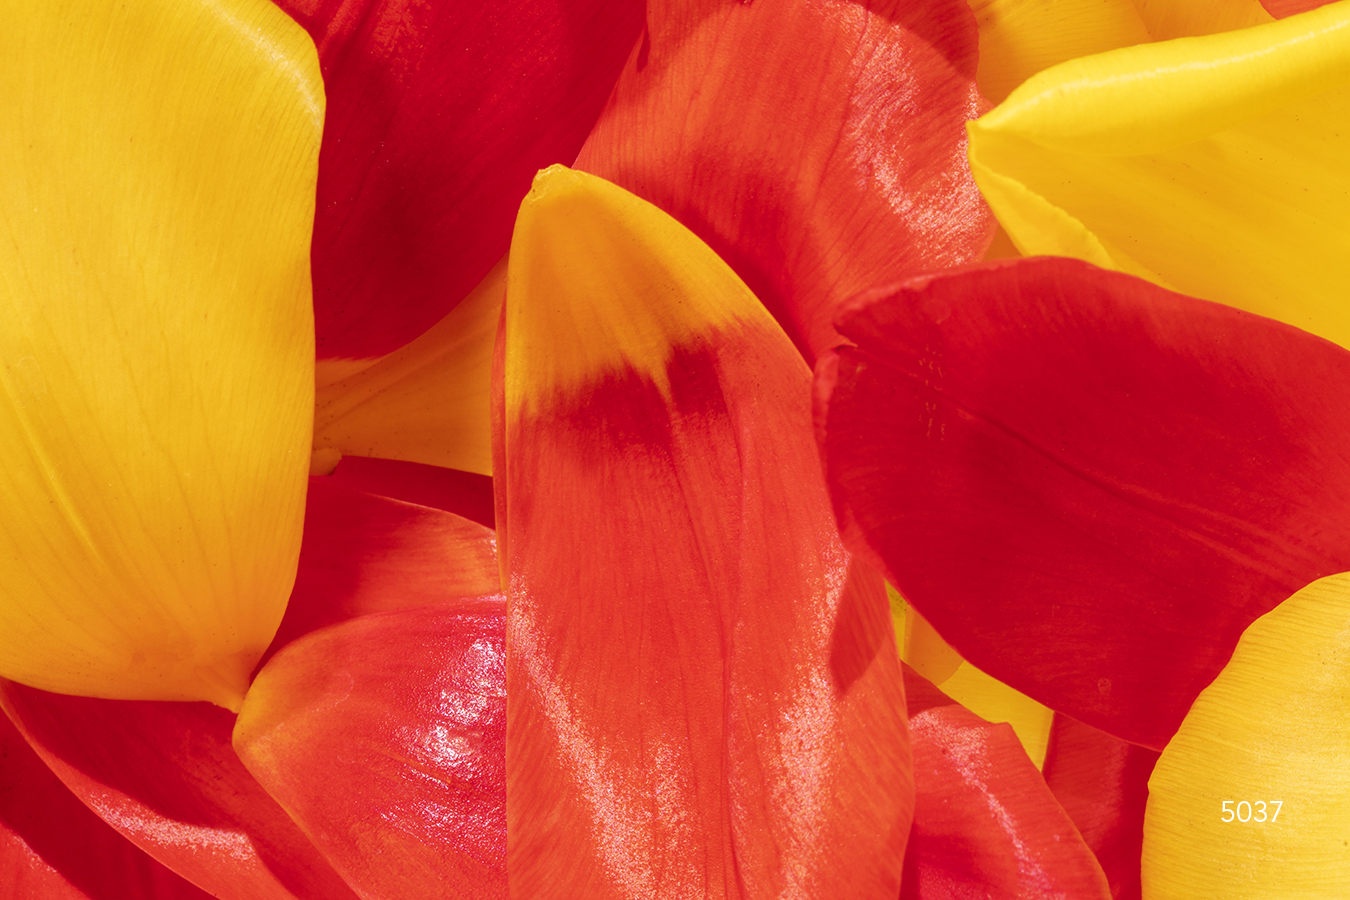 red yellow rose petal petals close up detail flower flowers